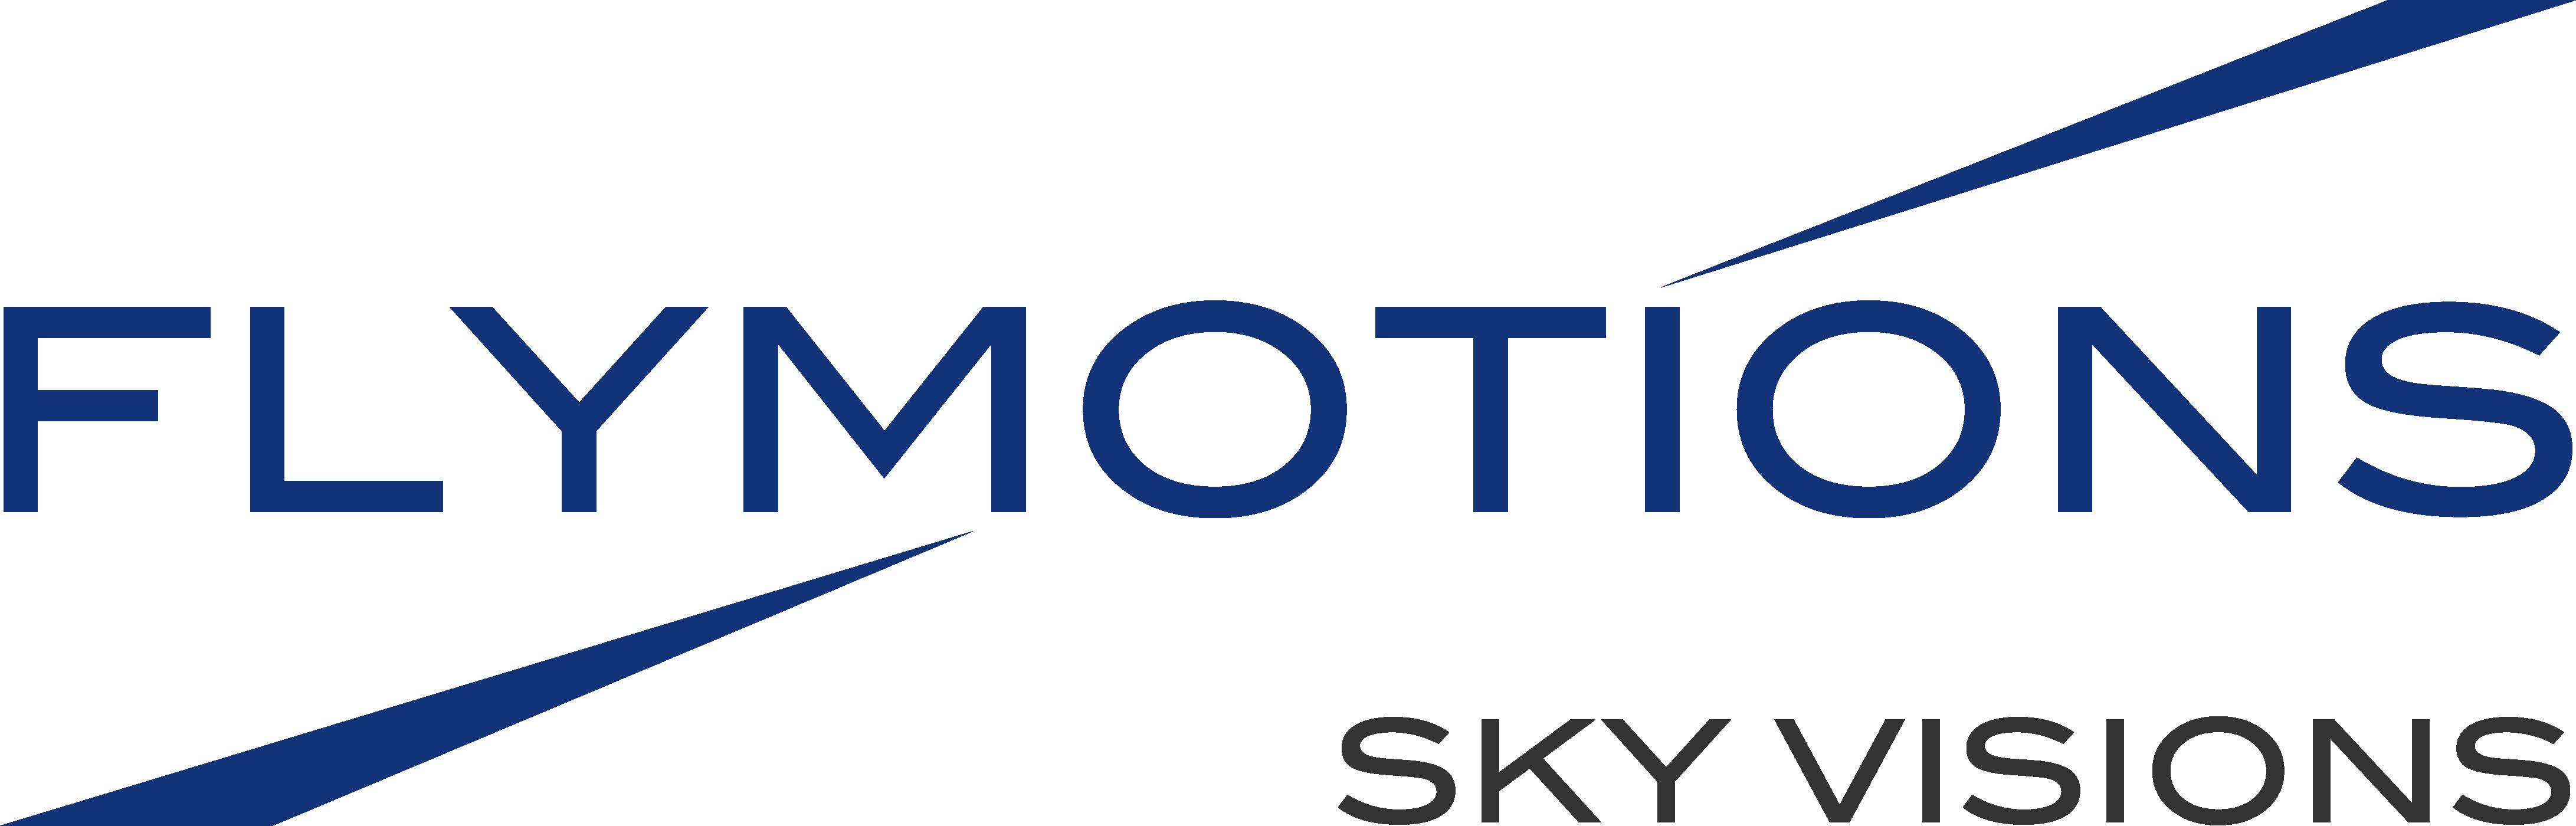 Logo von FLYMOTIONS | SKY VISIONS